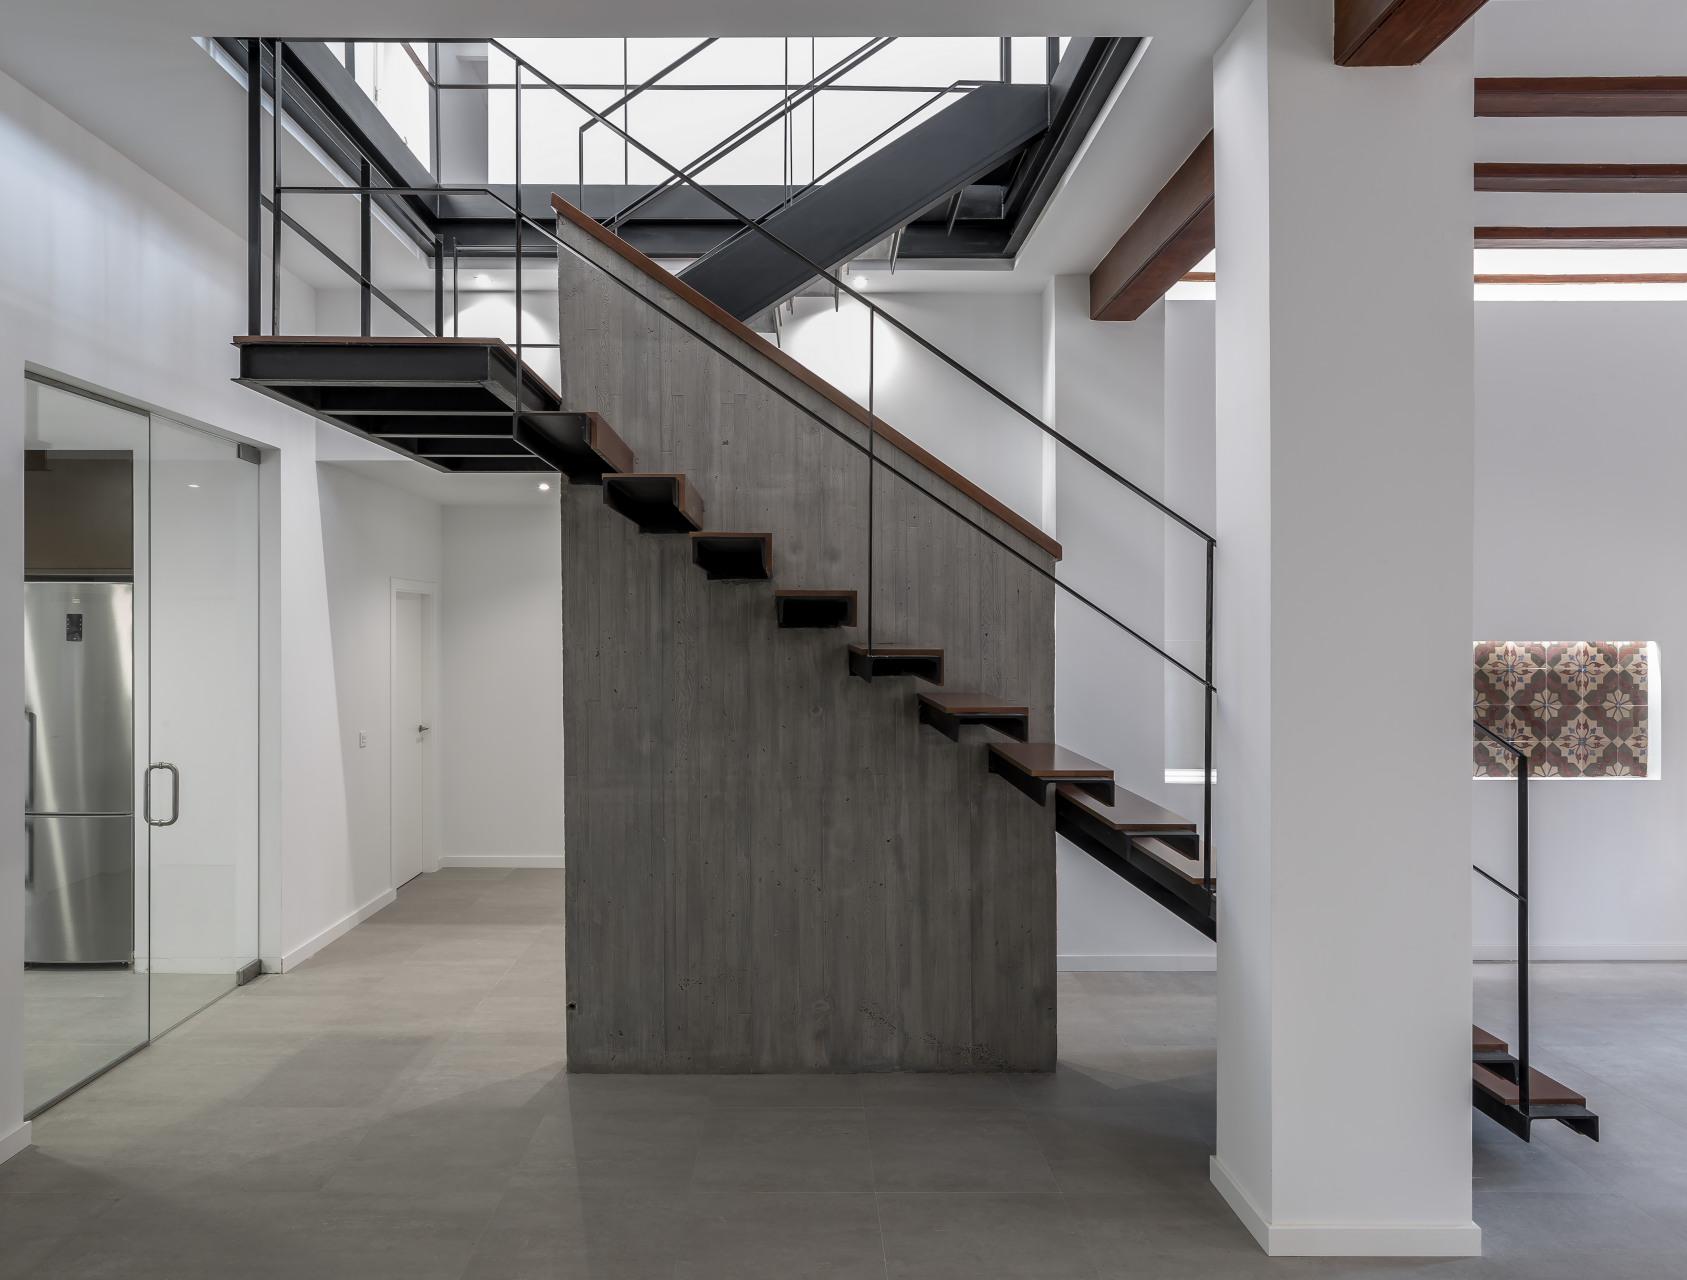 fotografia-arquitectura-valencia-german-cabo-viraje-rehabilitacion-campanar (5)